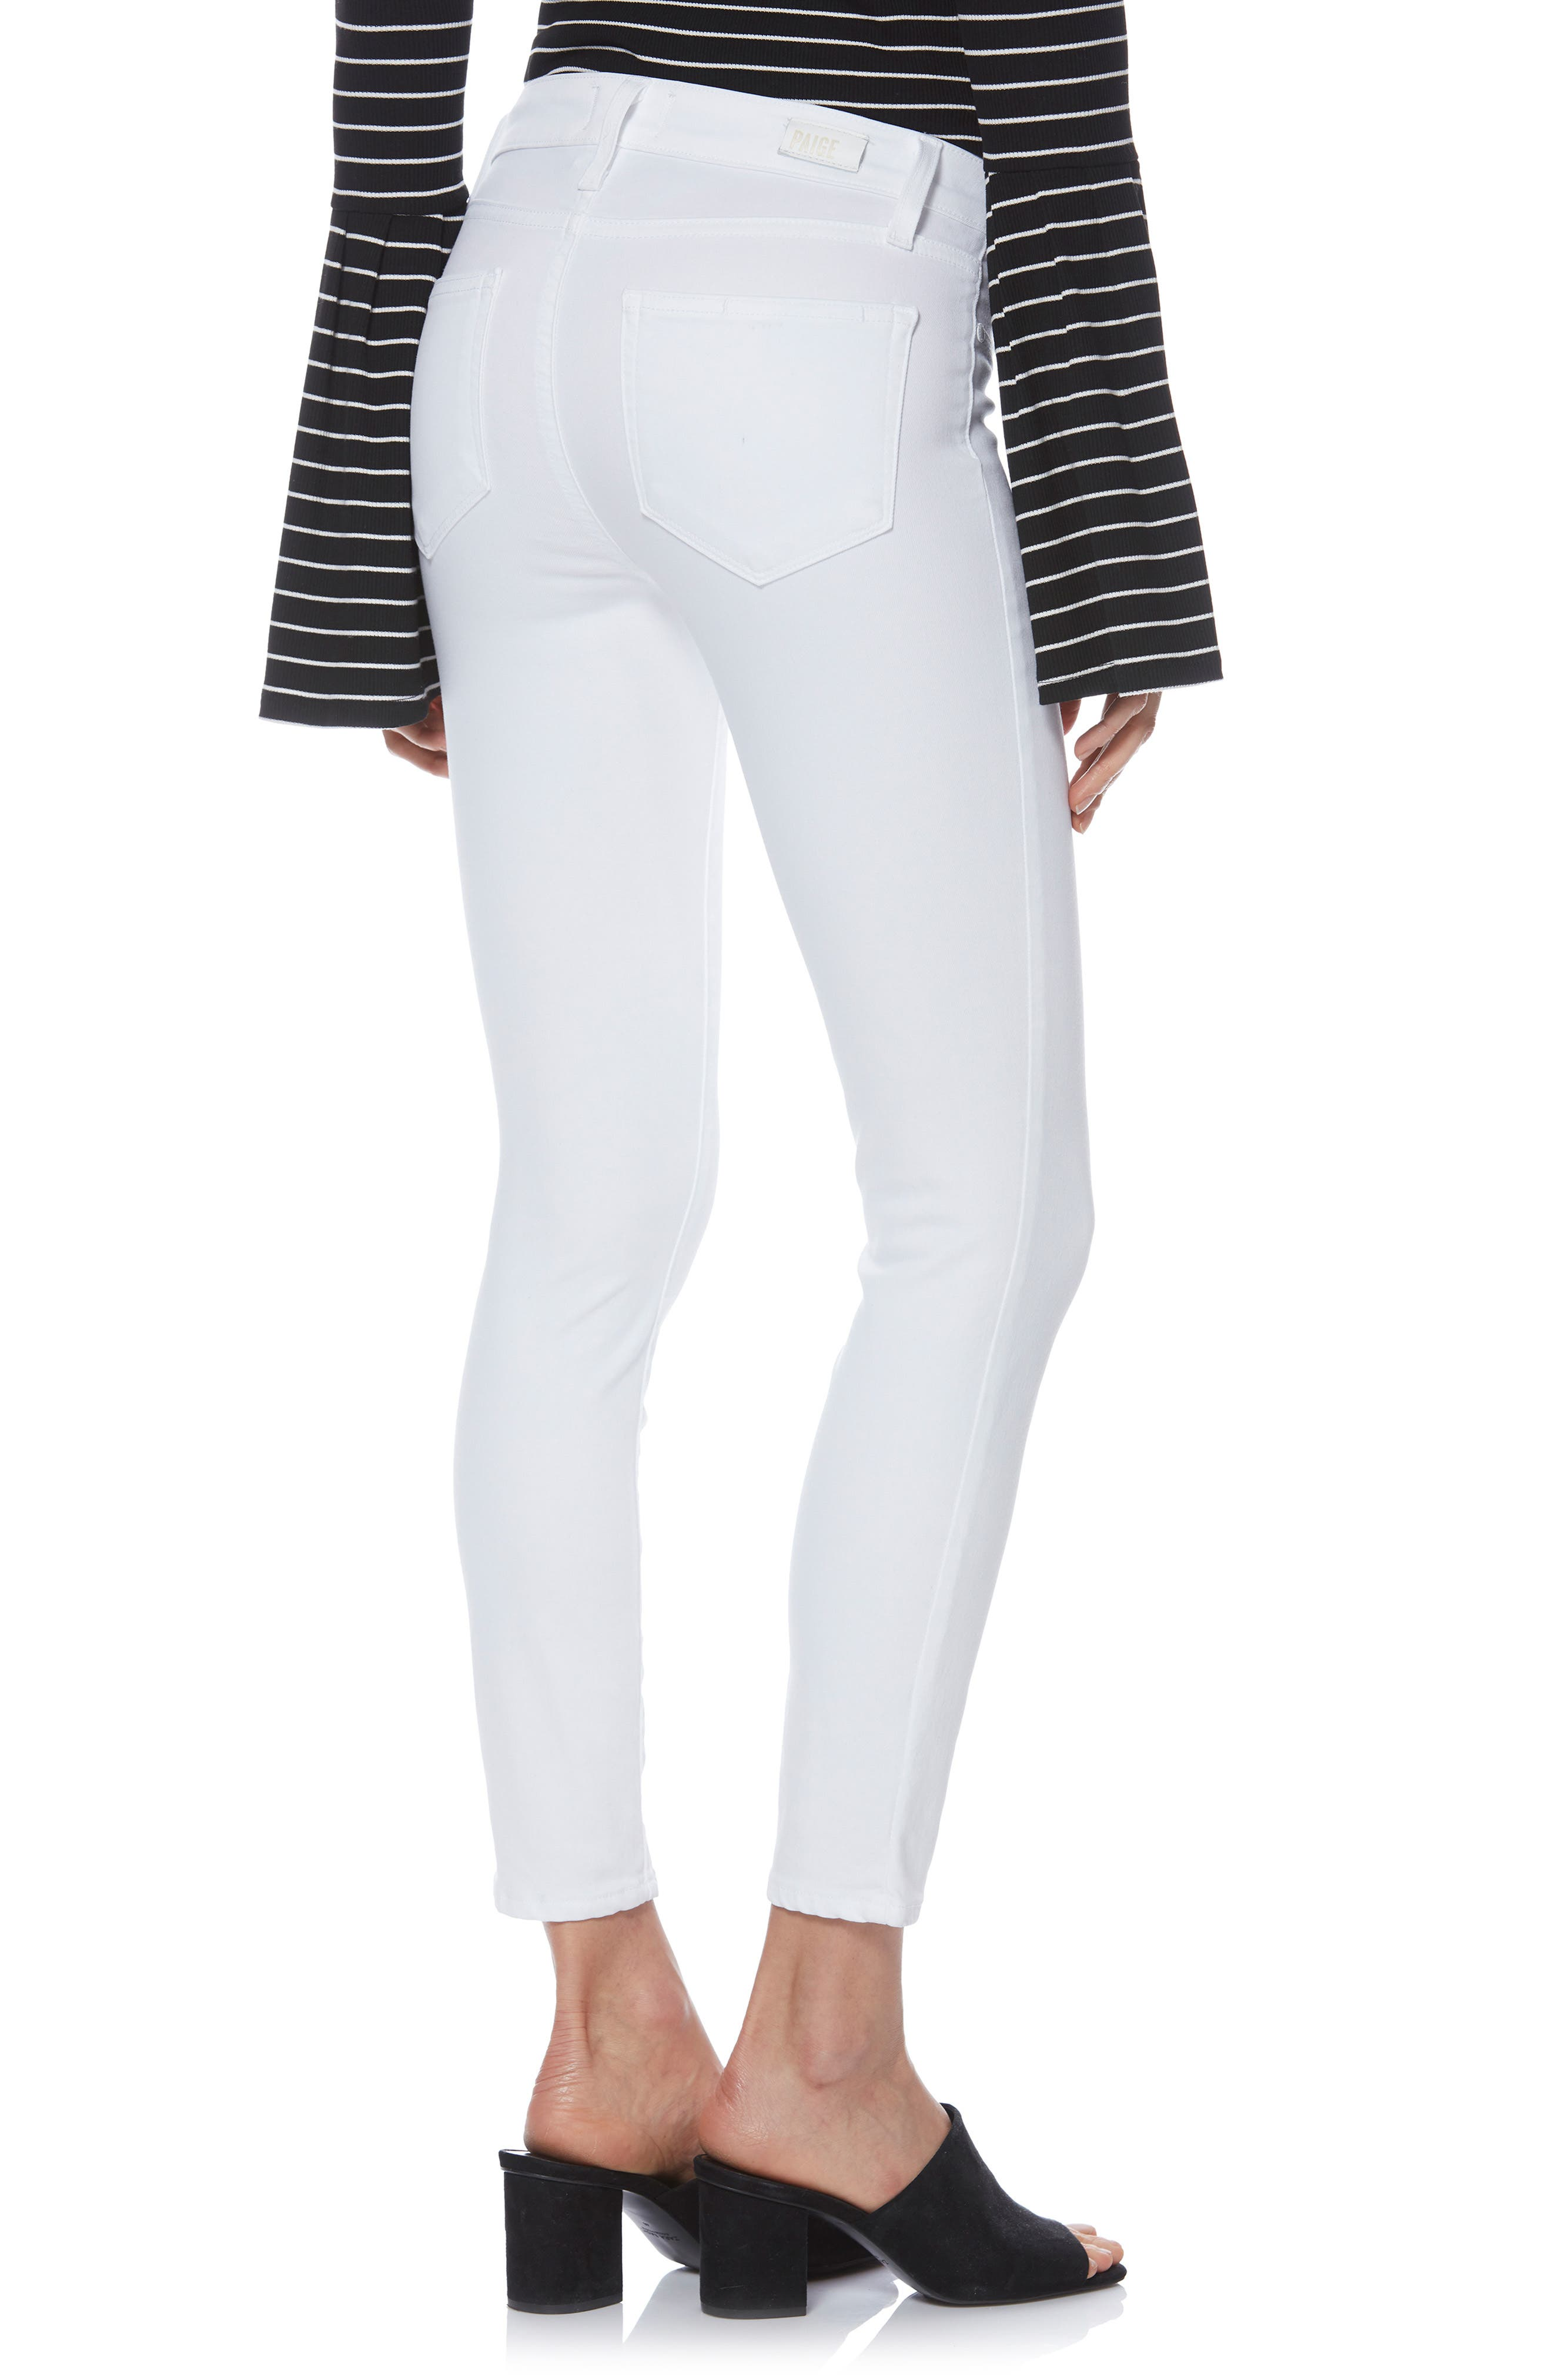 PAIGE,                             Verdugo Faux Pocket Crop Skinny Jeans,                             Alternate thumbnail 2, color,                             VIVID WHITE